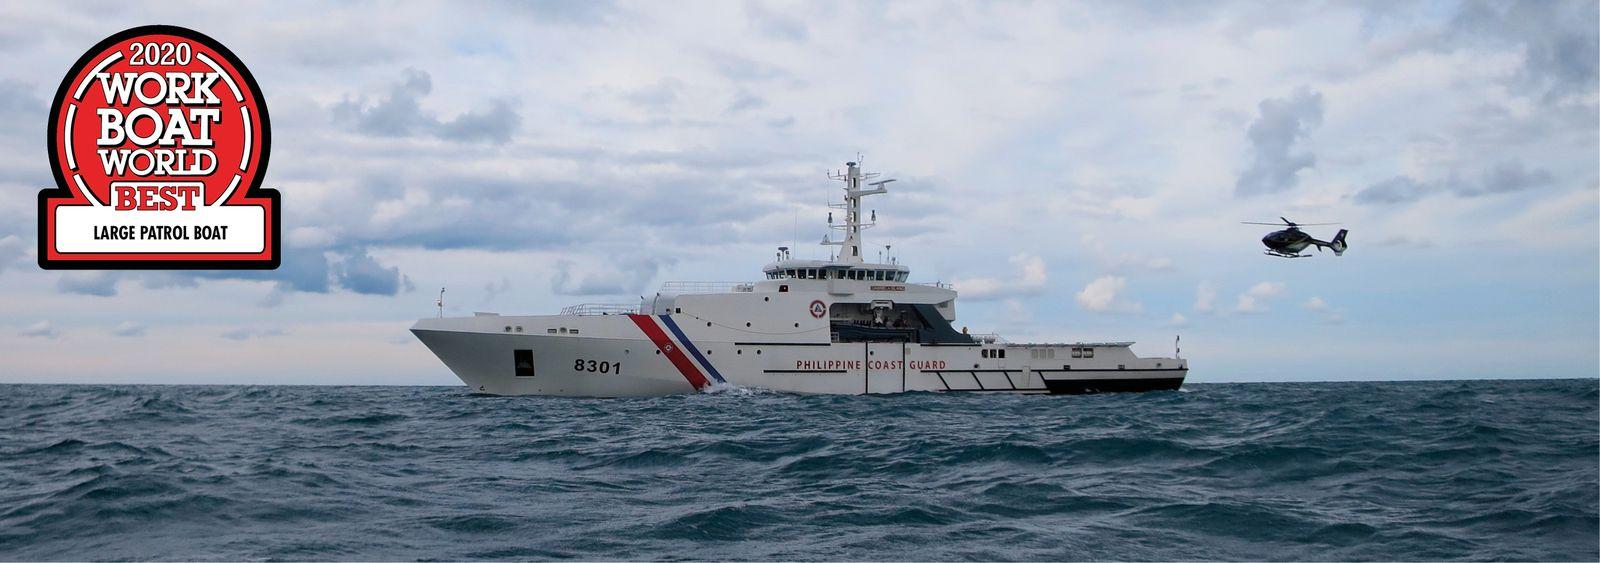 ocea-opv-270-deliveries